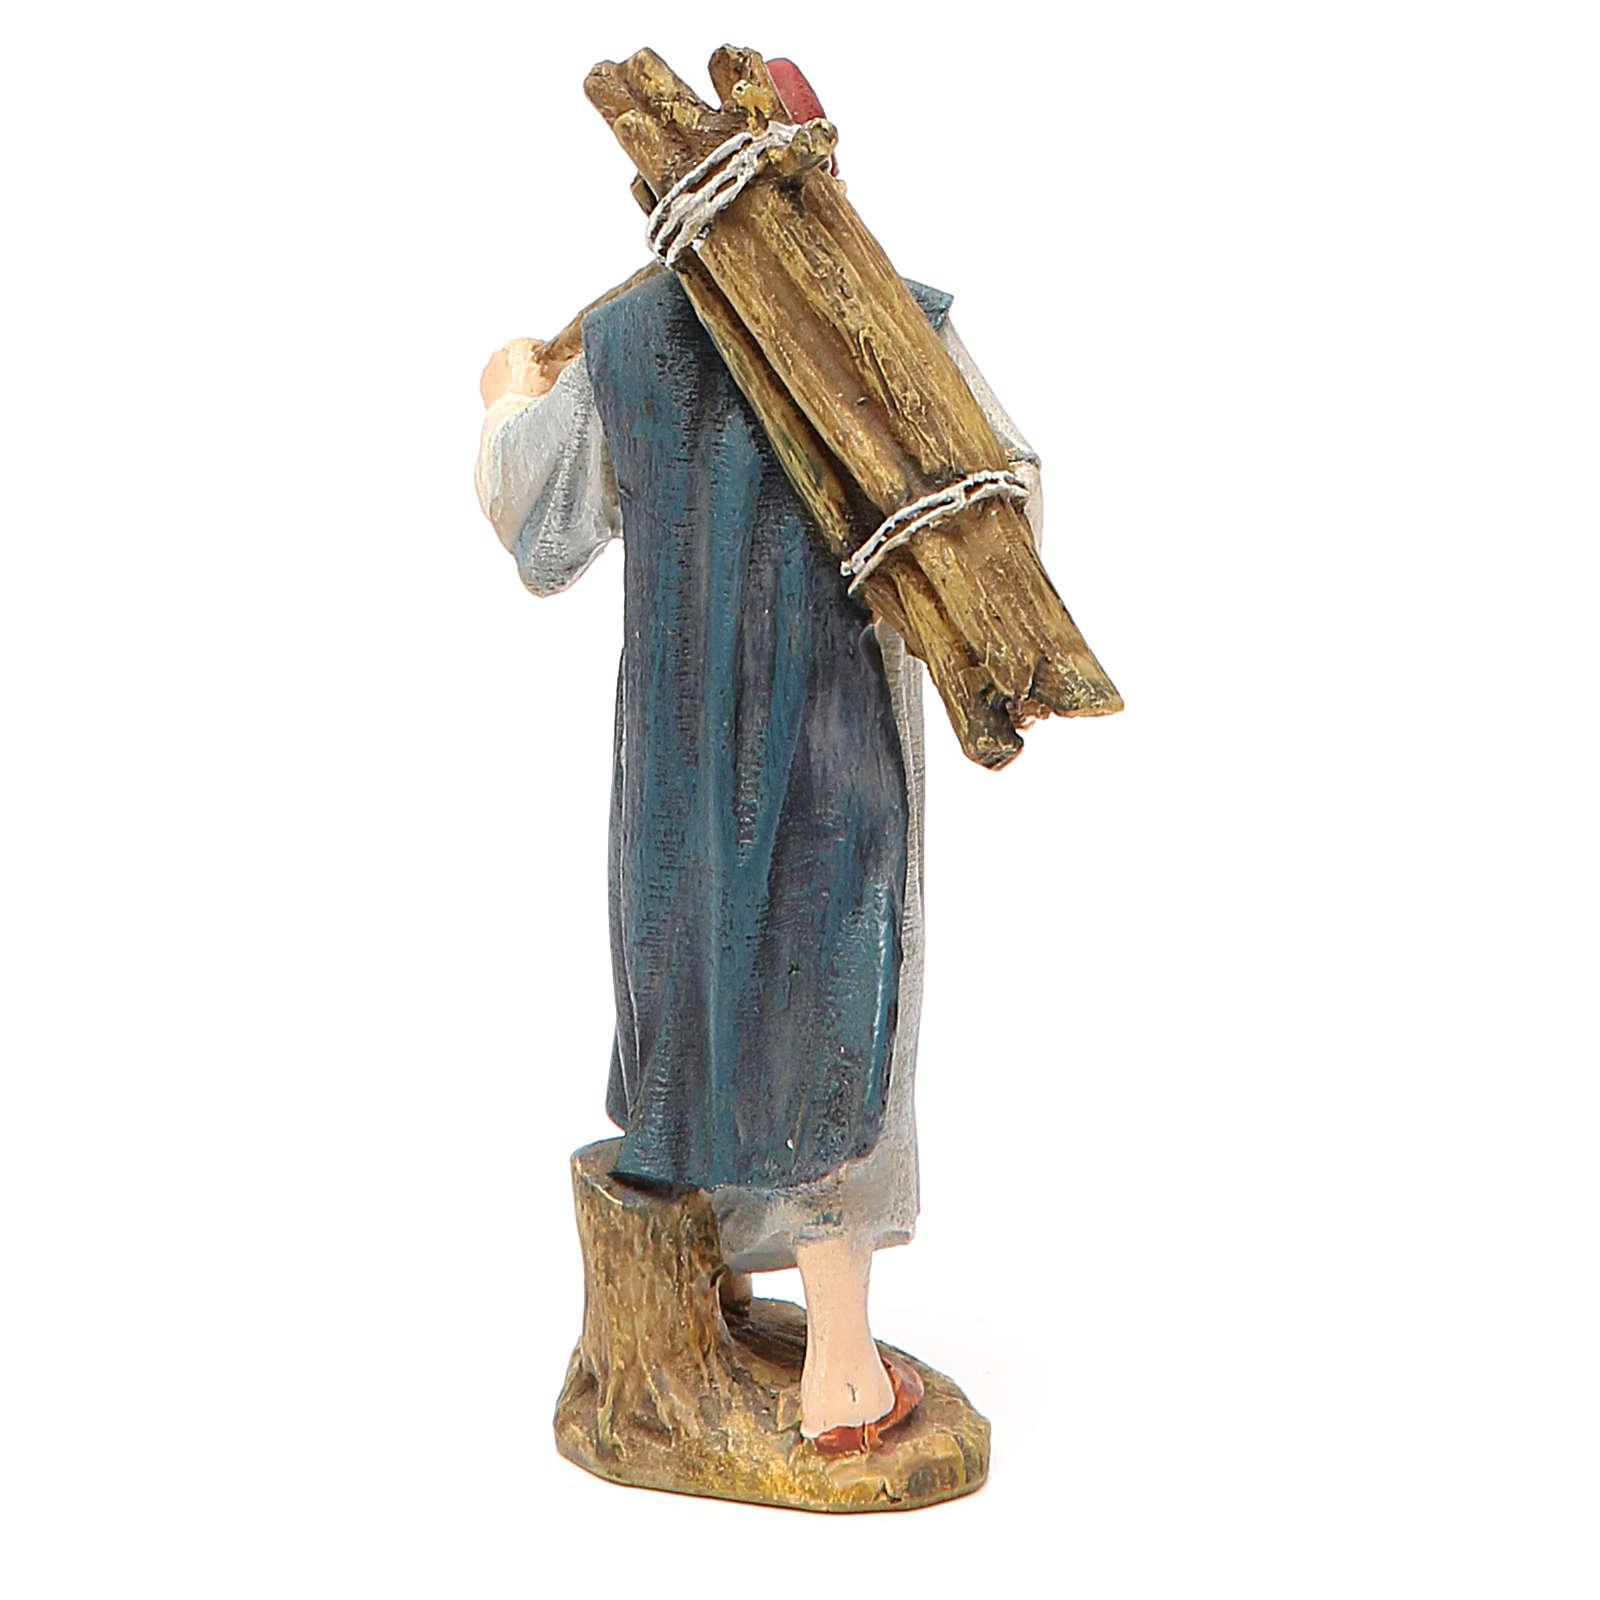 Pastore con legna resina dipinta cm 10 Linea economica Landi 3